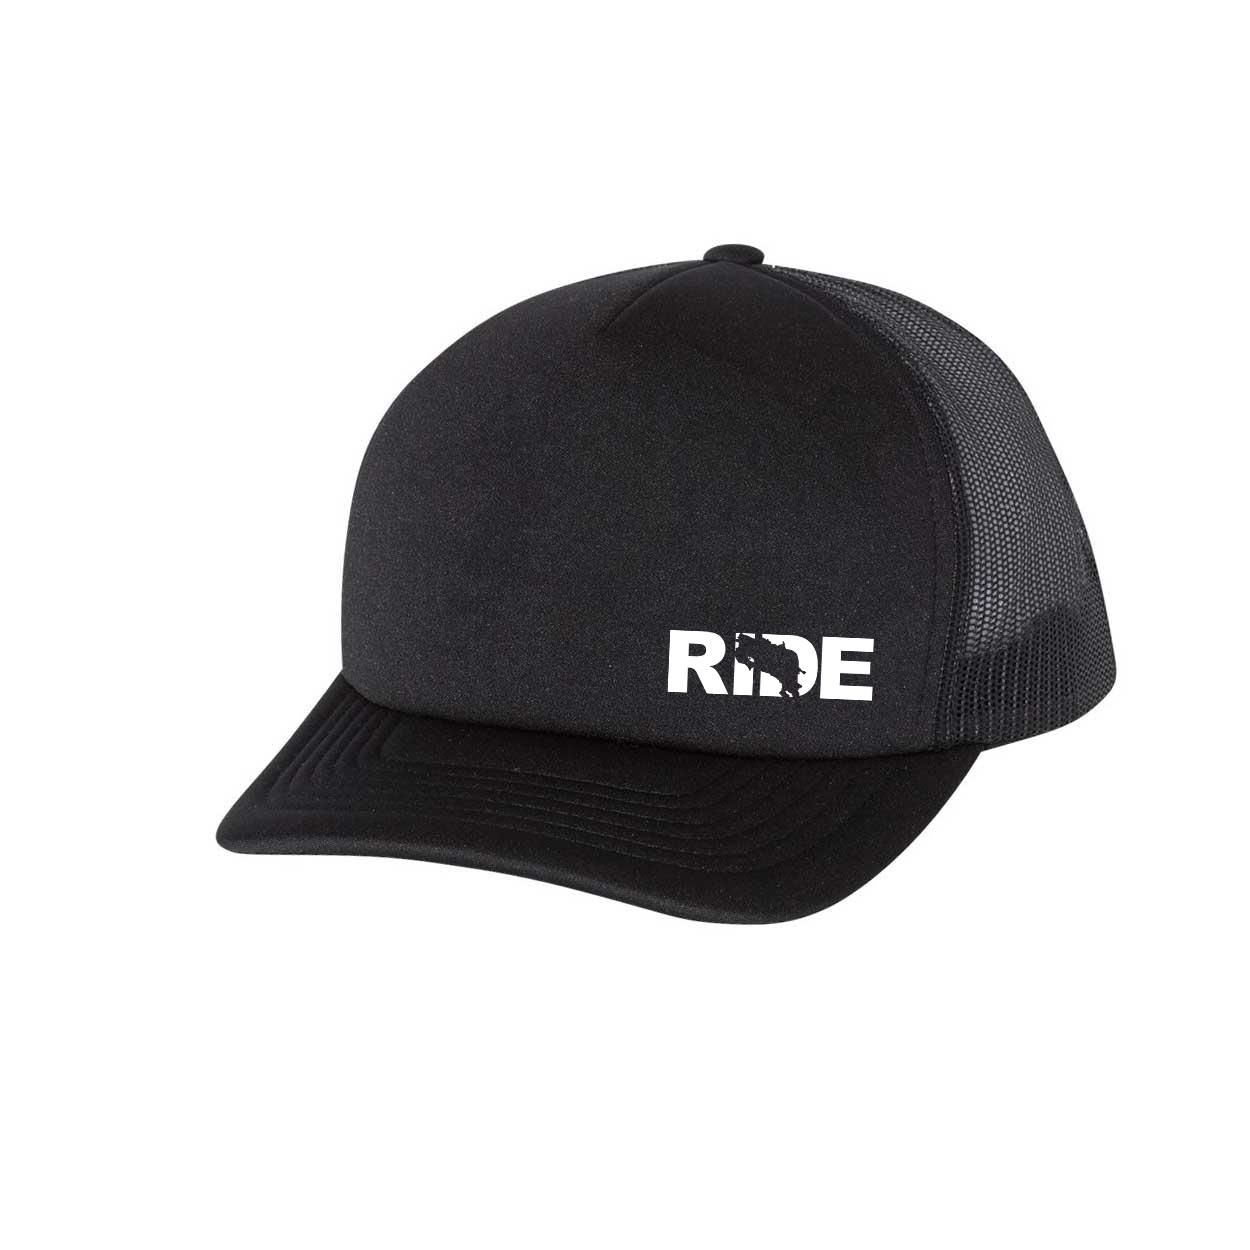 Ride Costa Rica Night Out Premium Foam Trucker Snapback Hat Black (White Logo)